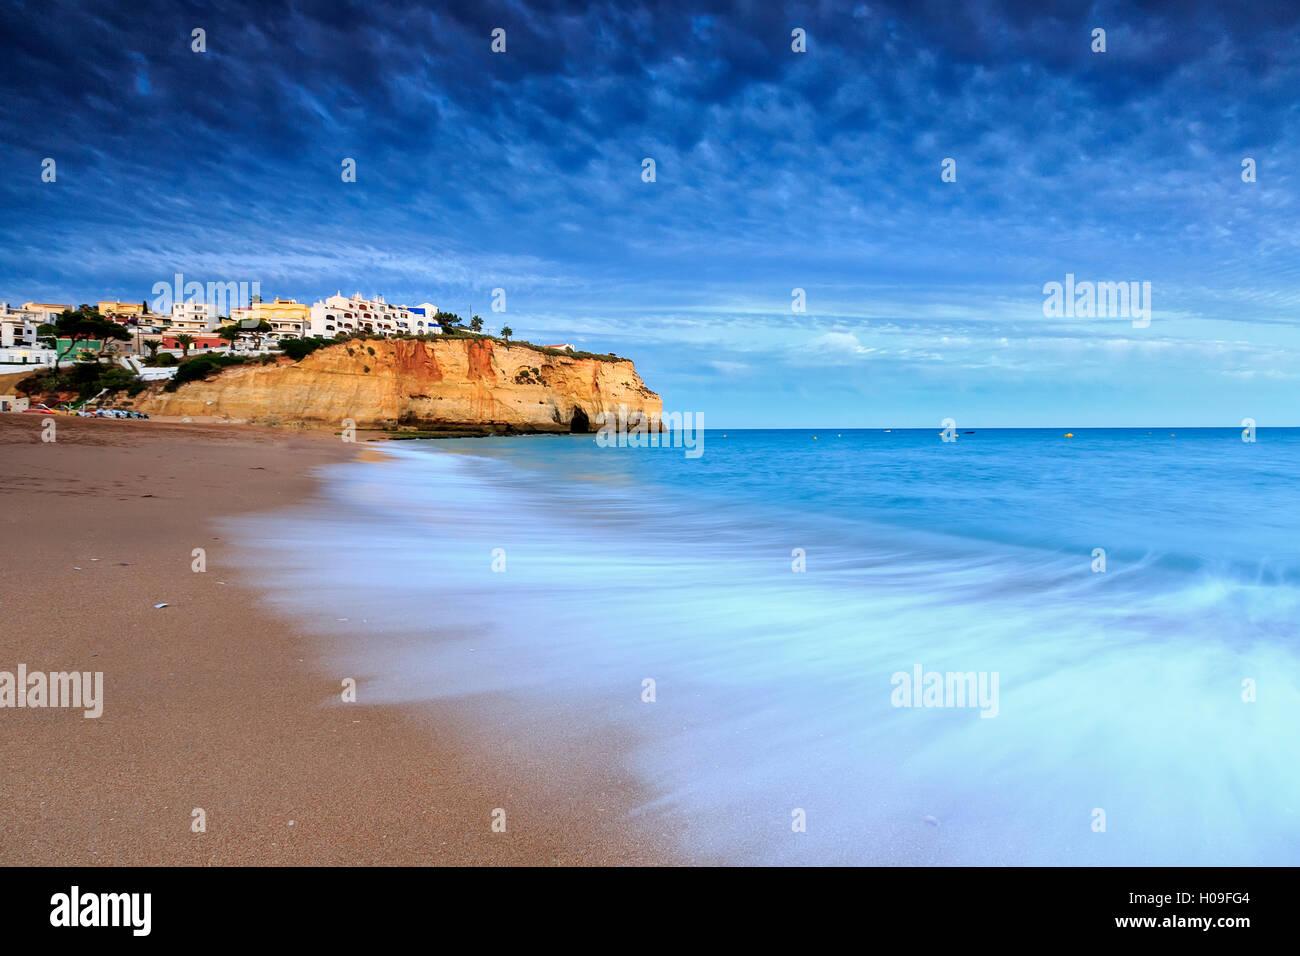 Ocean waves crashing on rocks and beach surrounding Carvoeiro village at sunset, Lagoa Municipality, Algarve, Portugal, Stock Photo